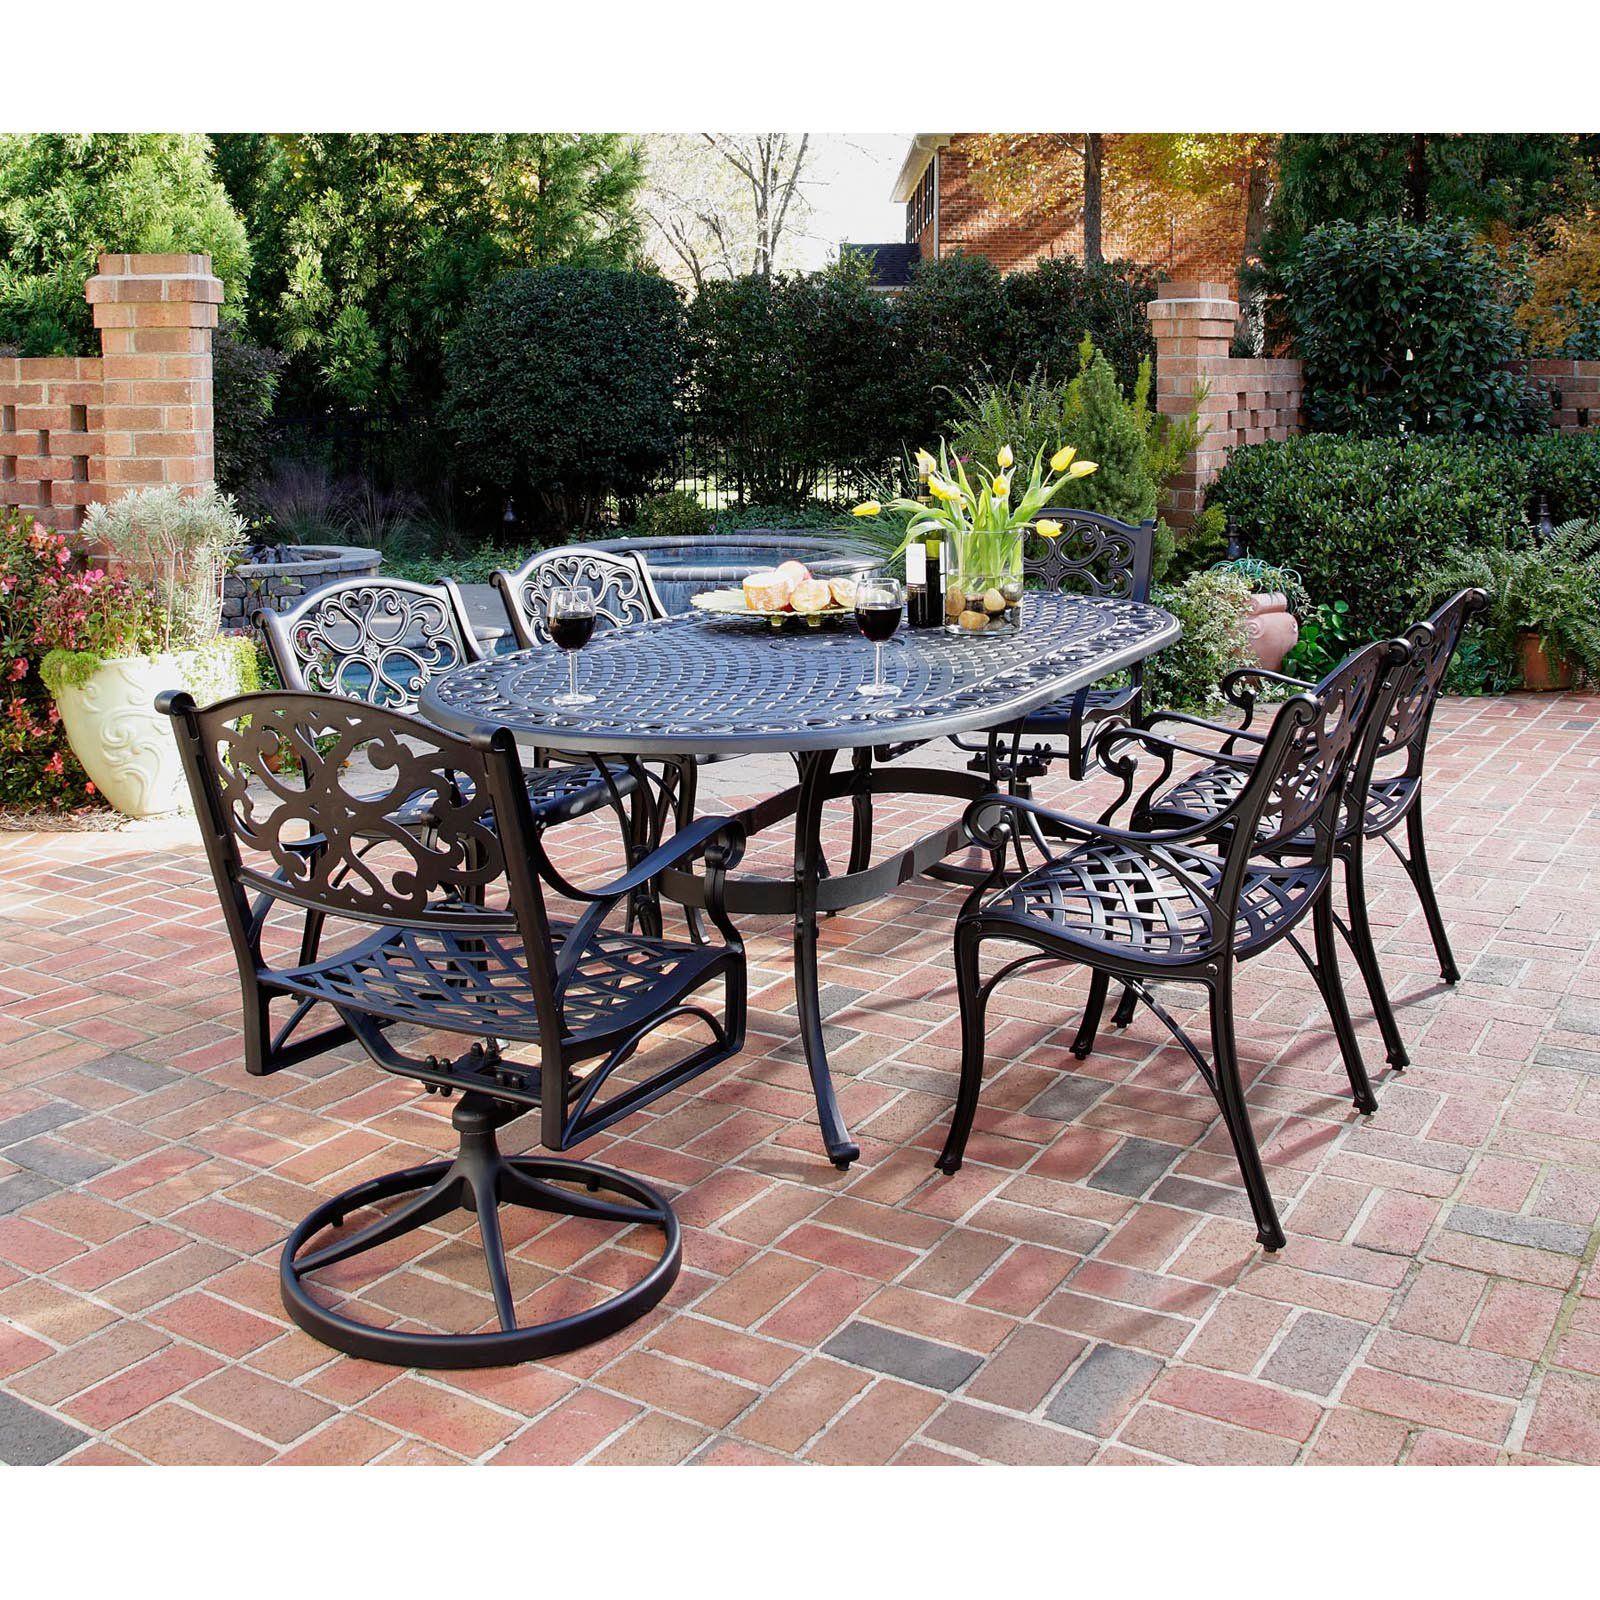 outdoor home styles biscayne black cast aluminum patio dining set rh pinterest com